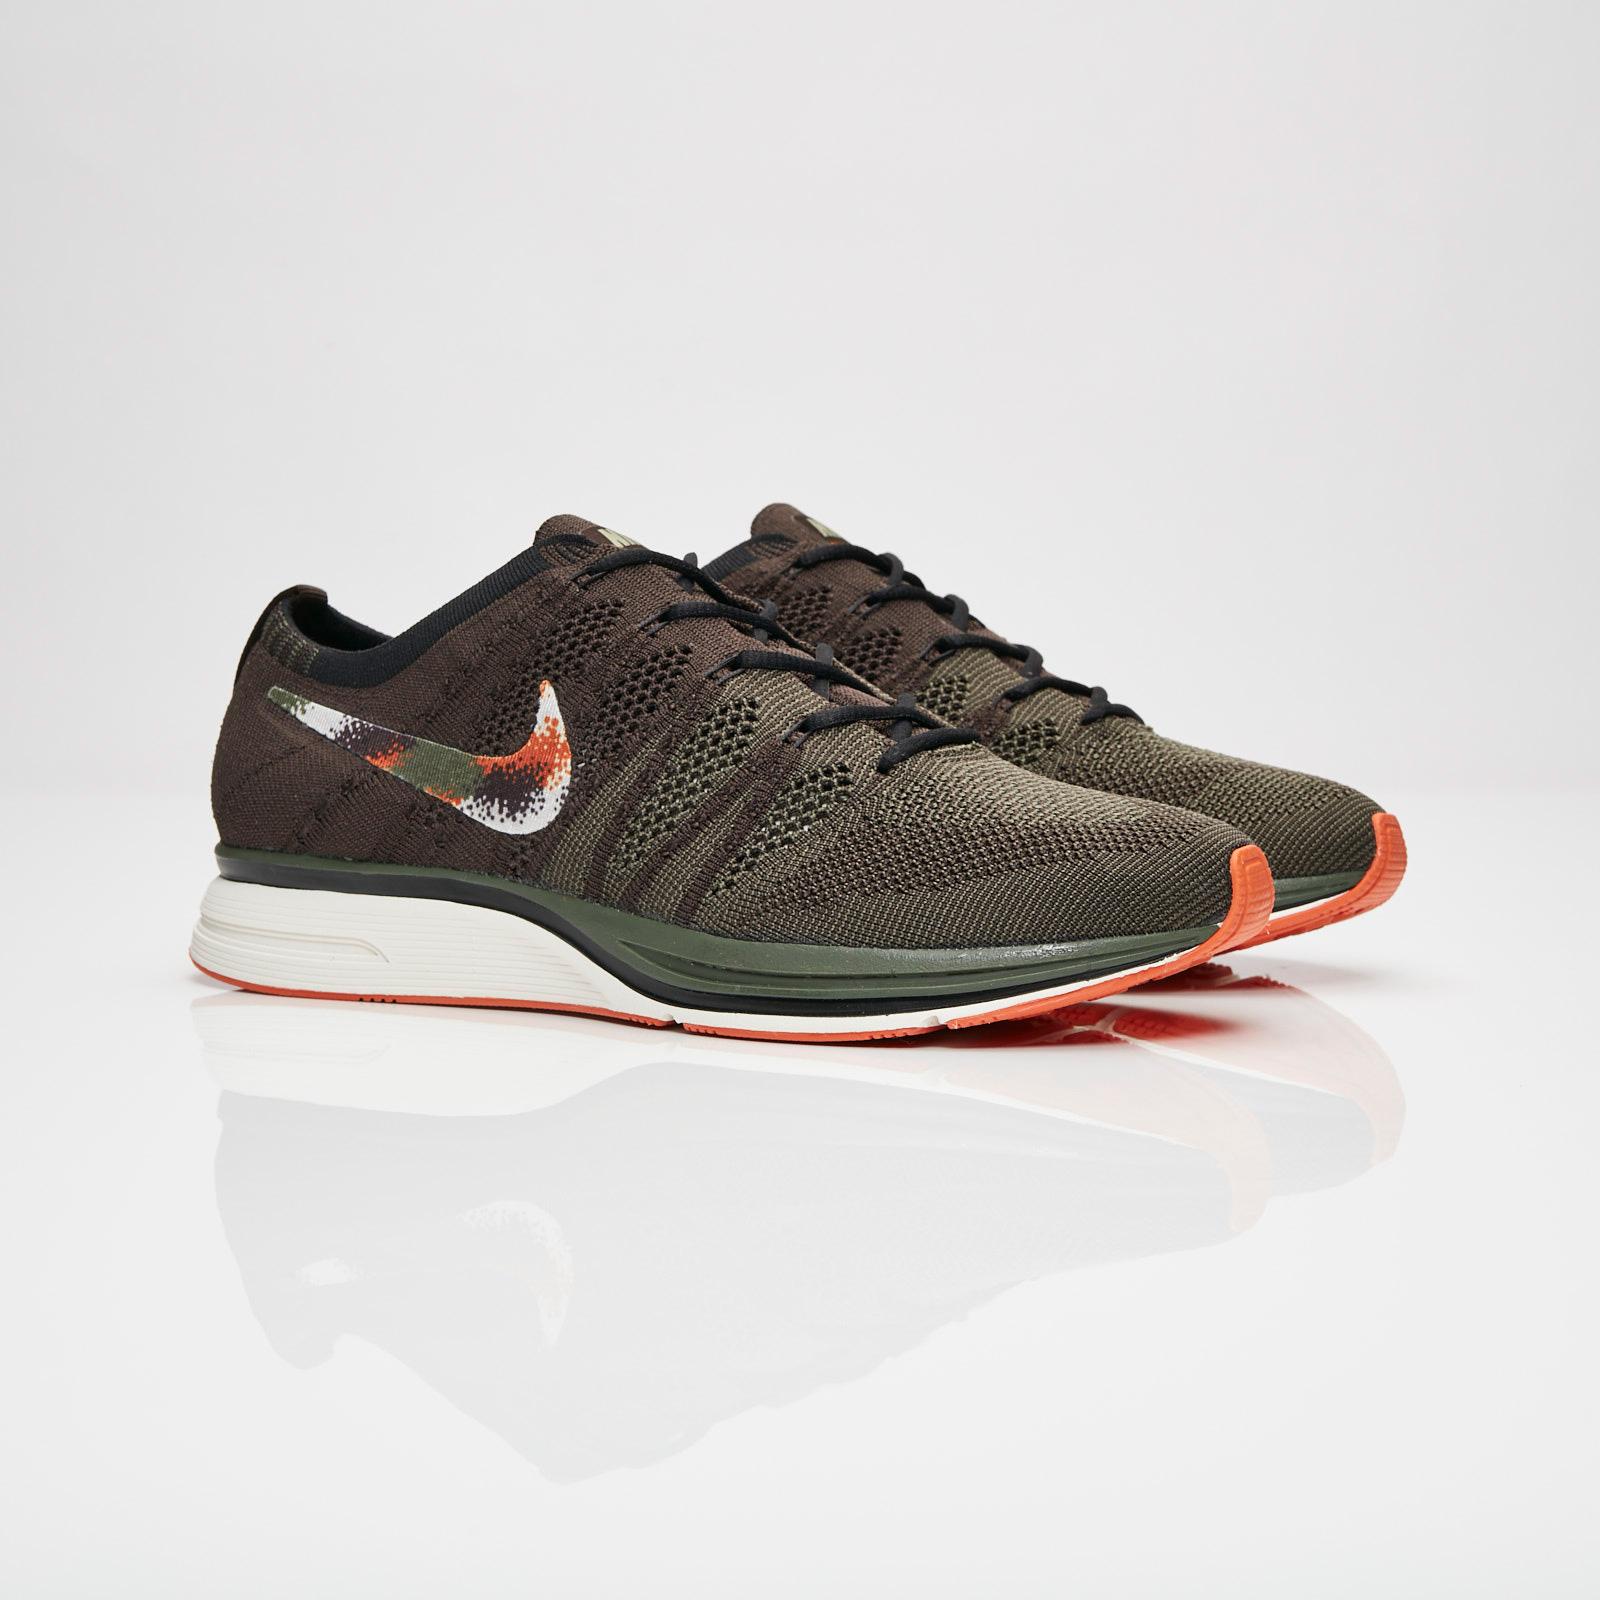 fdb6f202d2c14 Nike Flyknit Trainer - Ah8396-202 - Sneakersnstuff